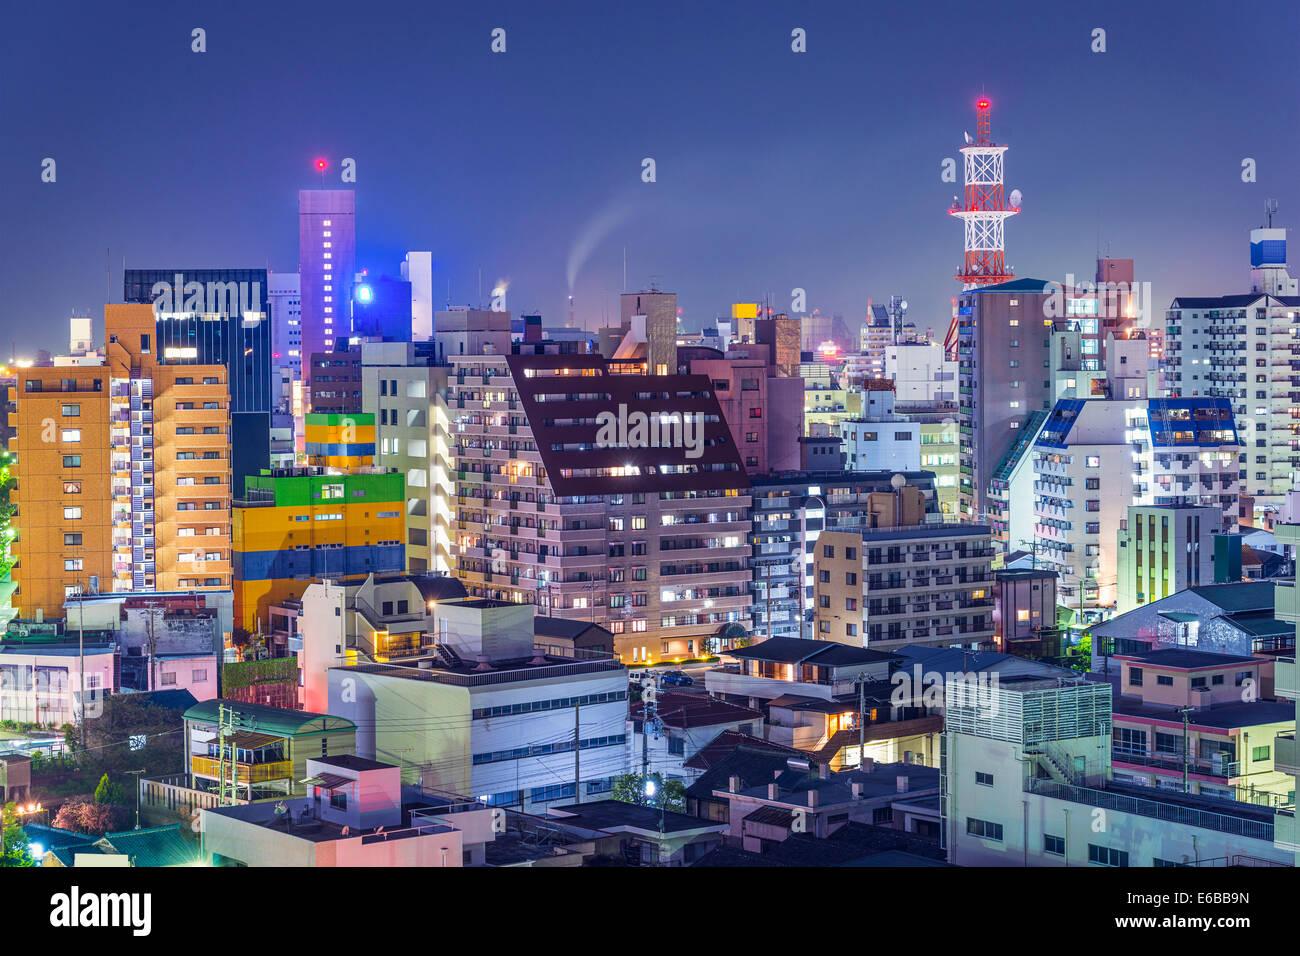 Wakayama, Japon centre-ville paysage urbain. Photo Stock